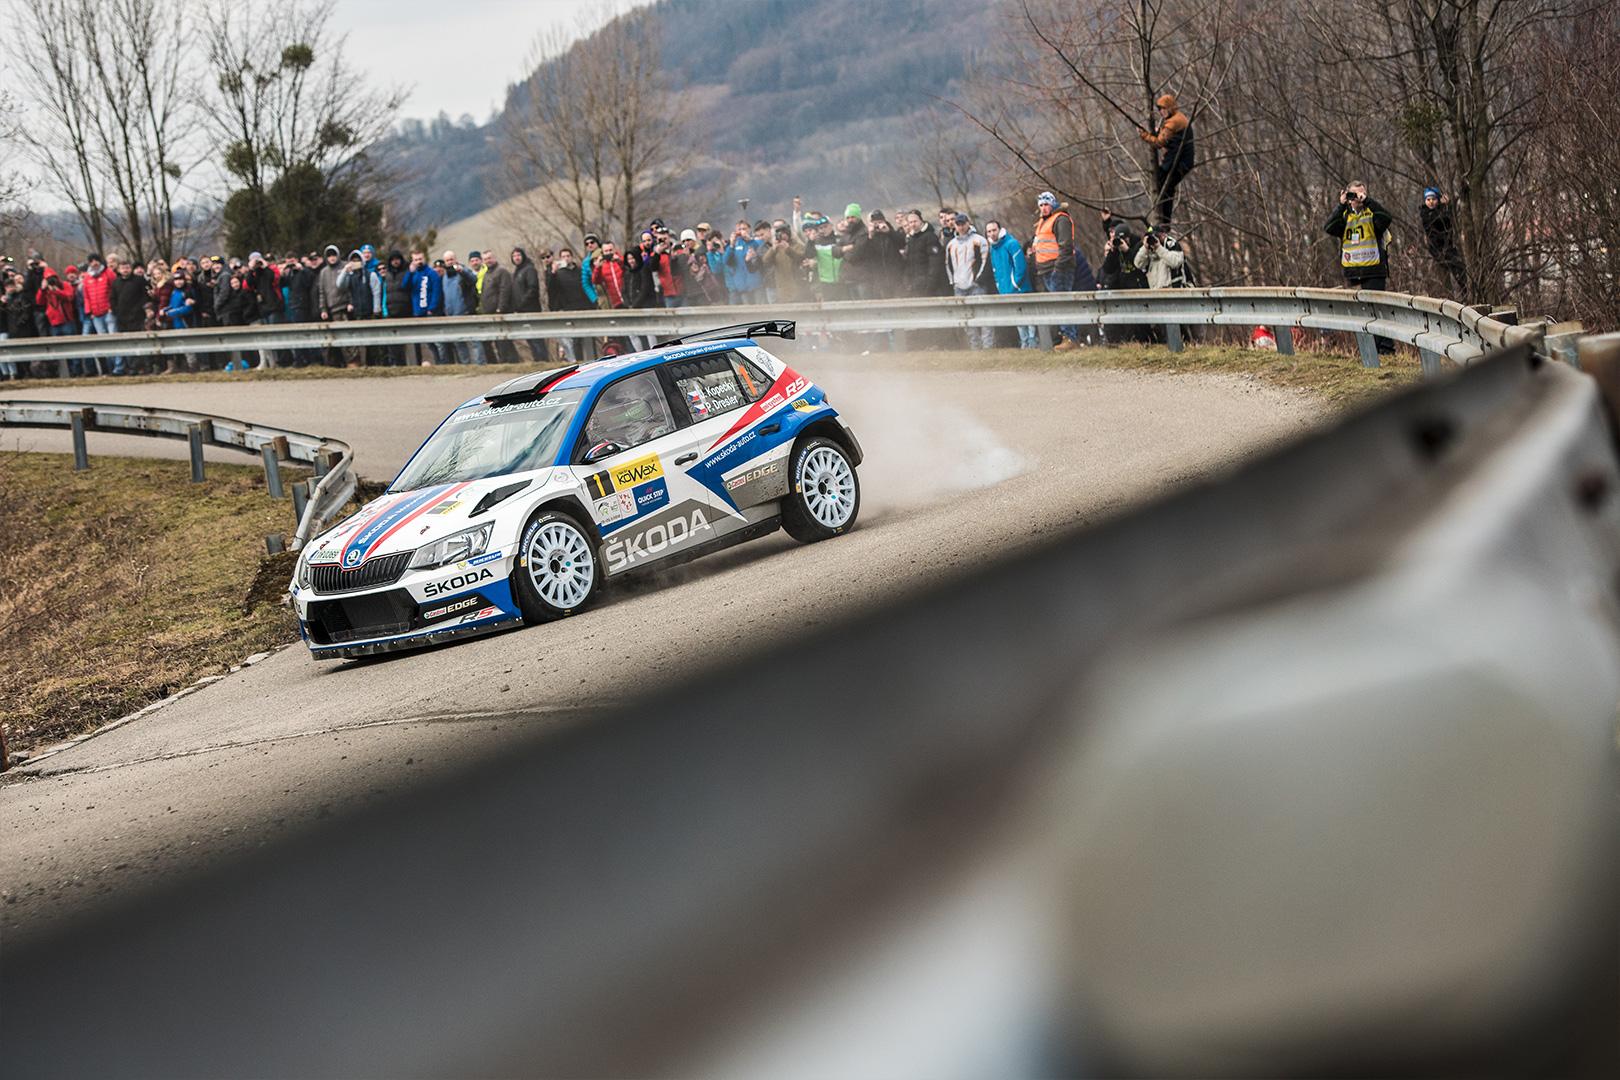 Rallye Šumava Starts Tommorrow: Kopecký to Defend the Lead